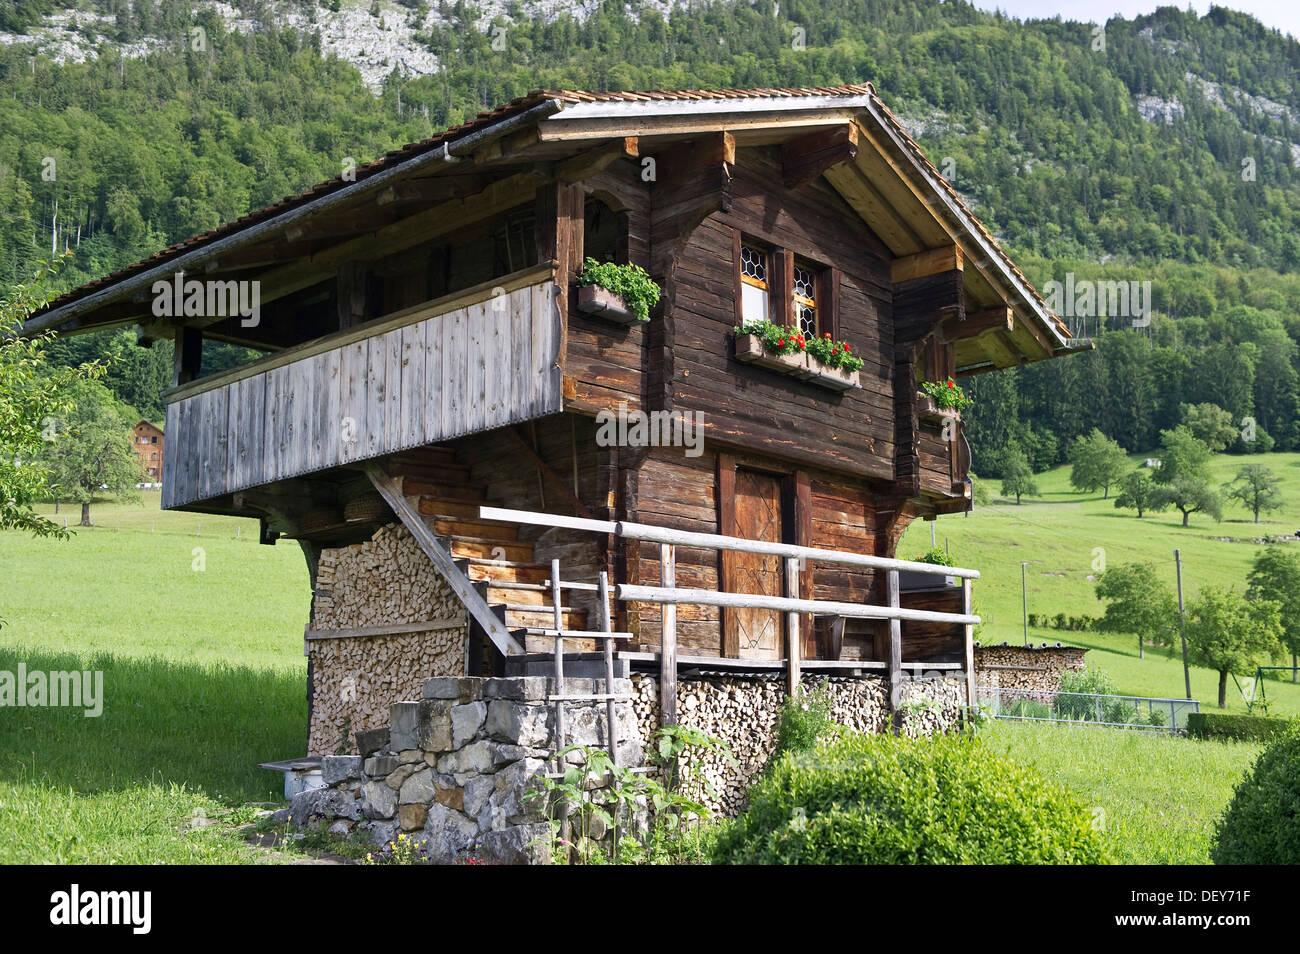 Scheune auf dem Pilatus, Kanton Luzern, Schweiz, Europa Stockbild